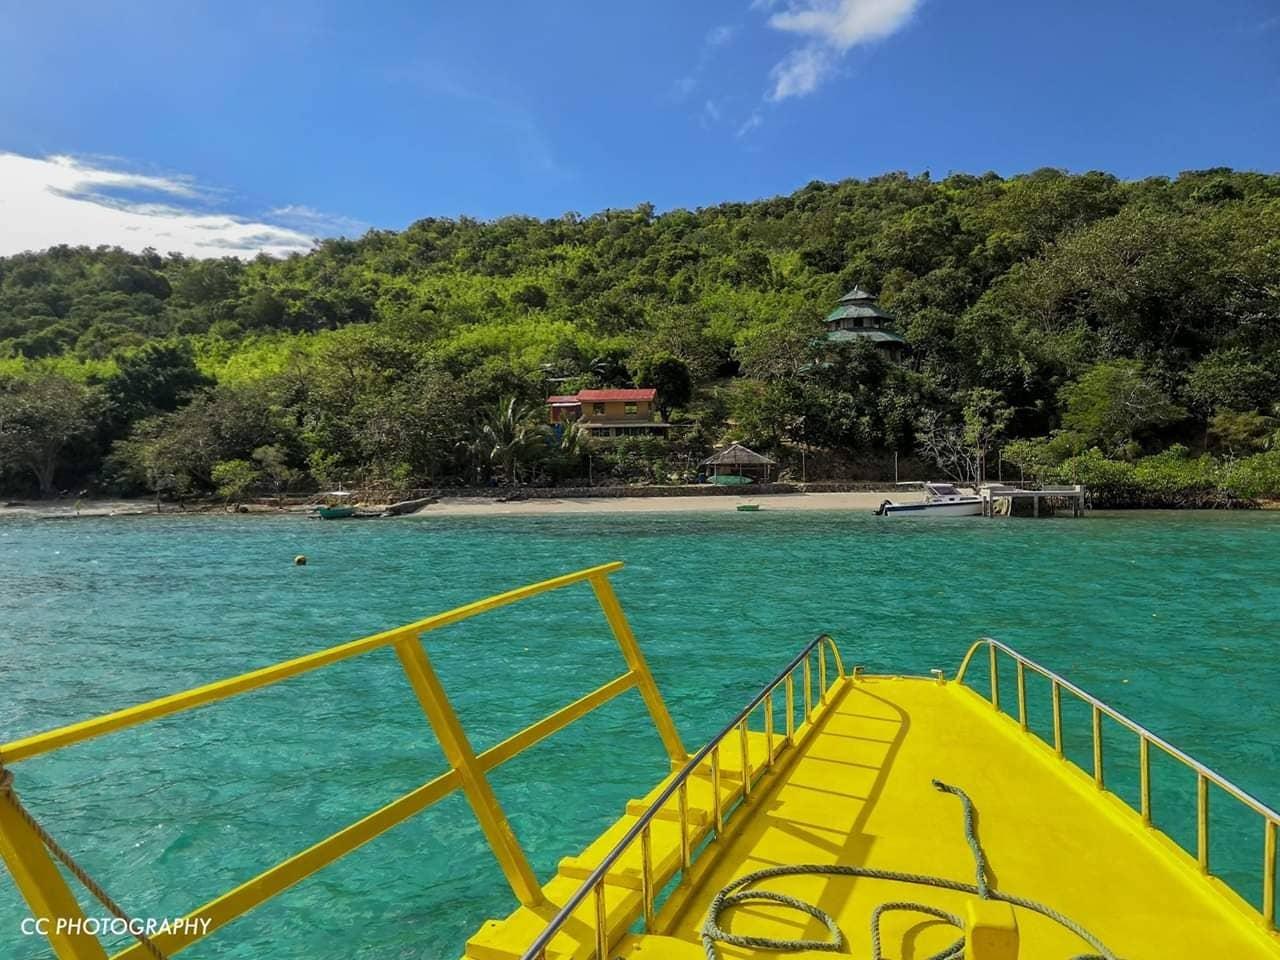 Cawa Cawa resort, Palawan, Philippines